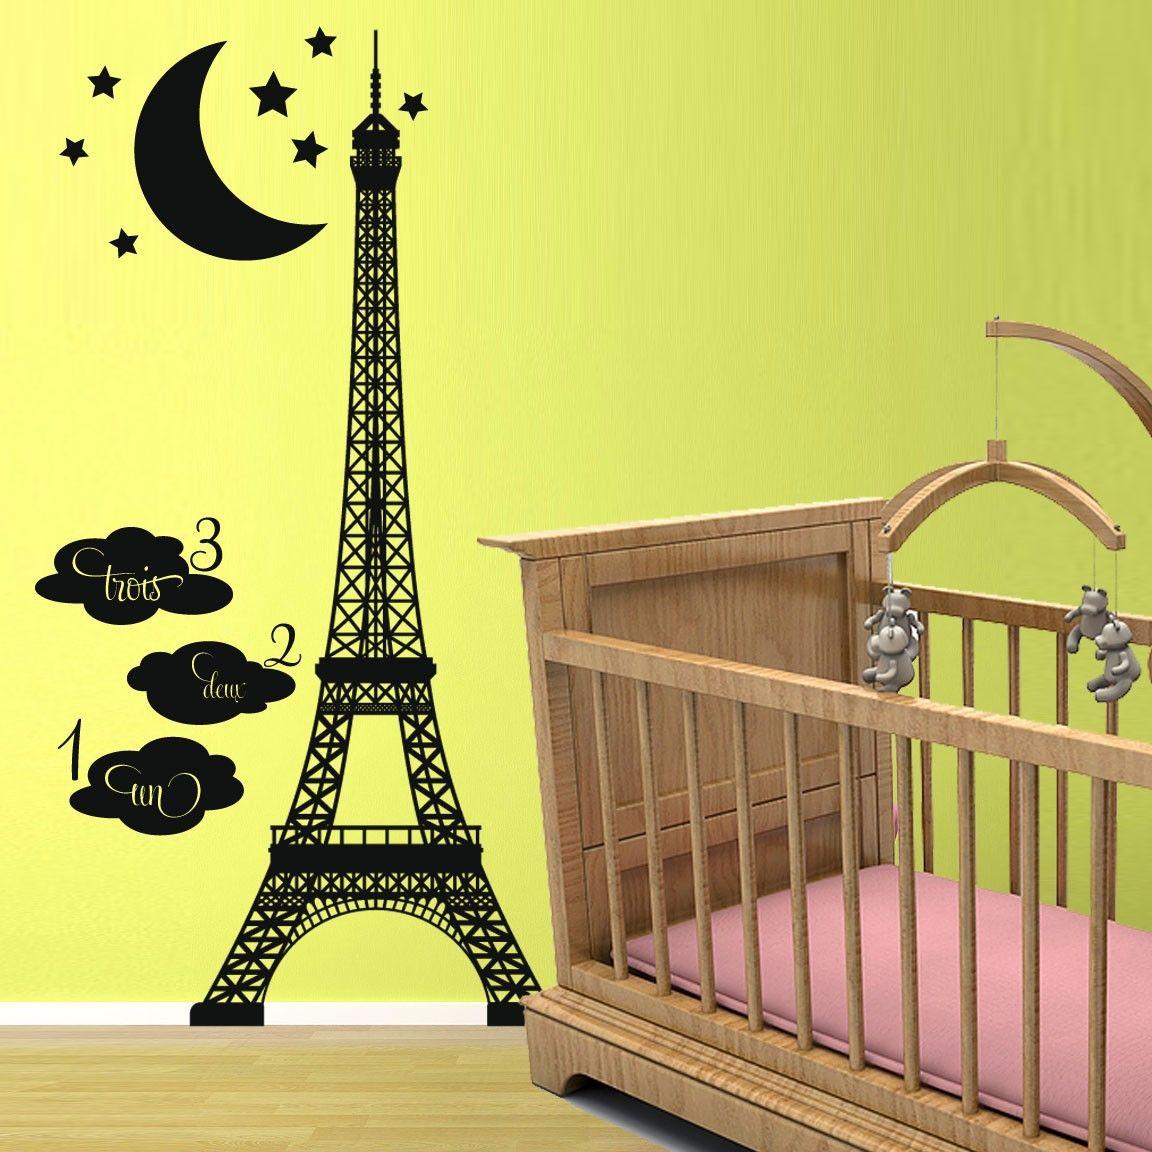 Magnificent Eiffel Tower Vinyl Wall Art Images - The Wall Art ...